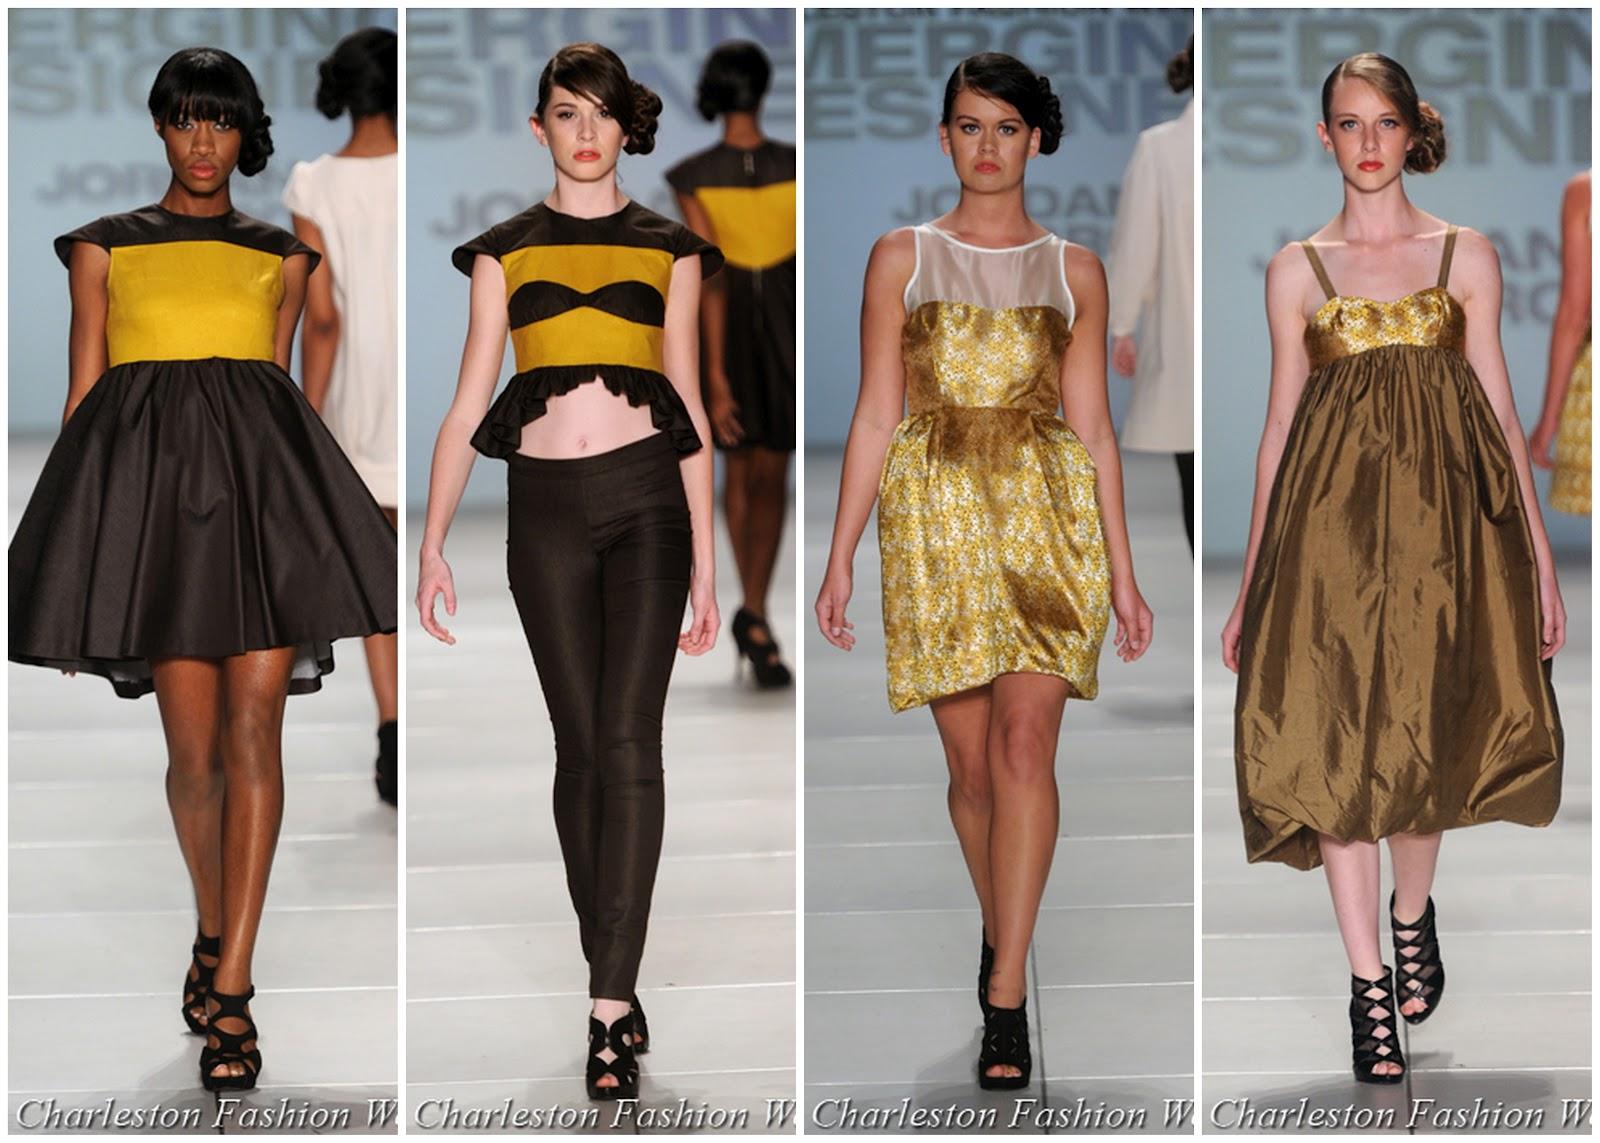 Look Linger Love Charleston Fashion Week 2012 Thursday